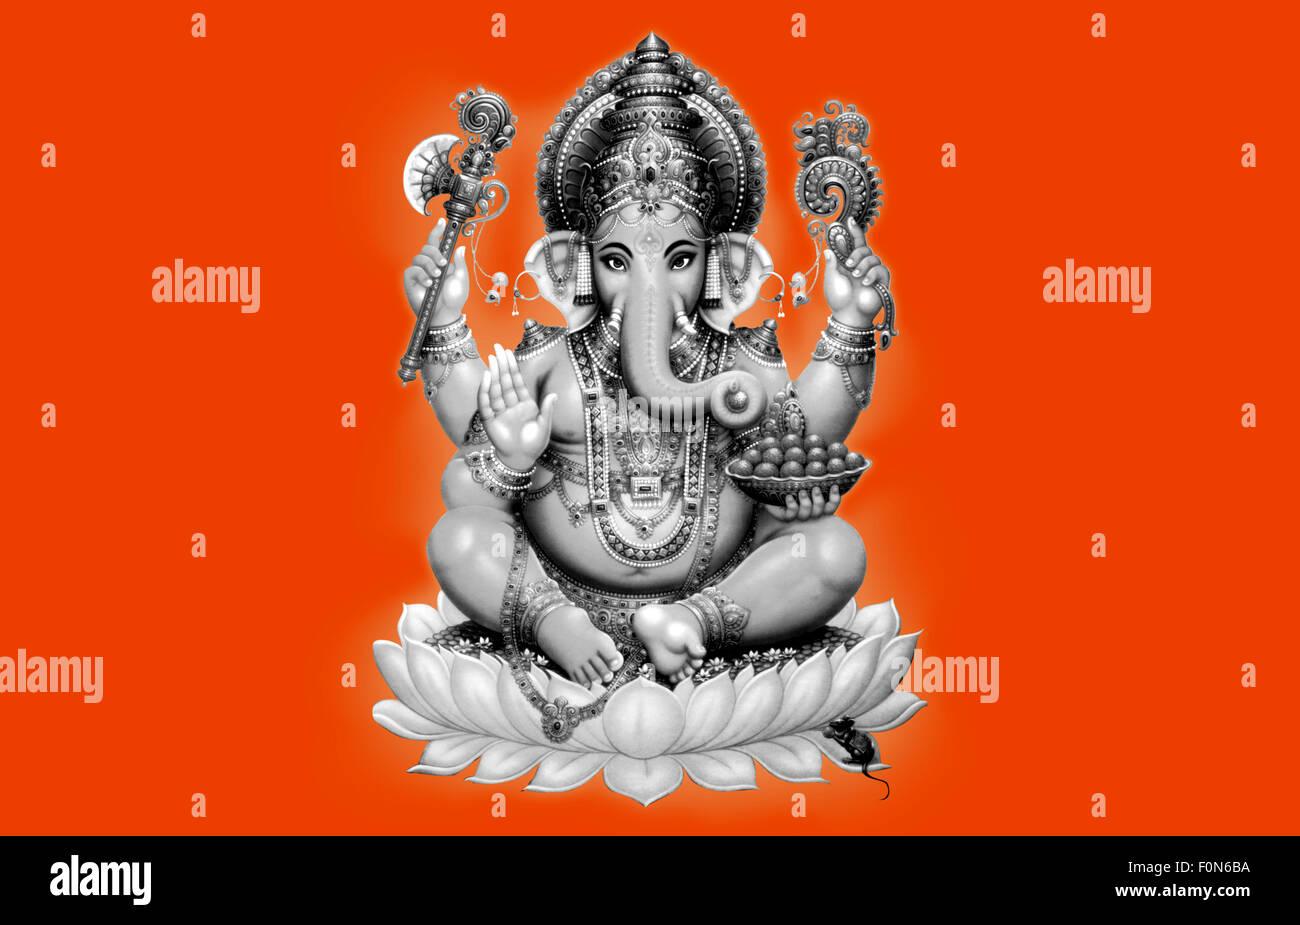 Black And White Ganesha Statue Stock Photos Amp Black And